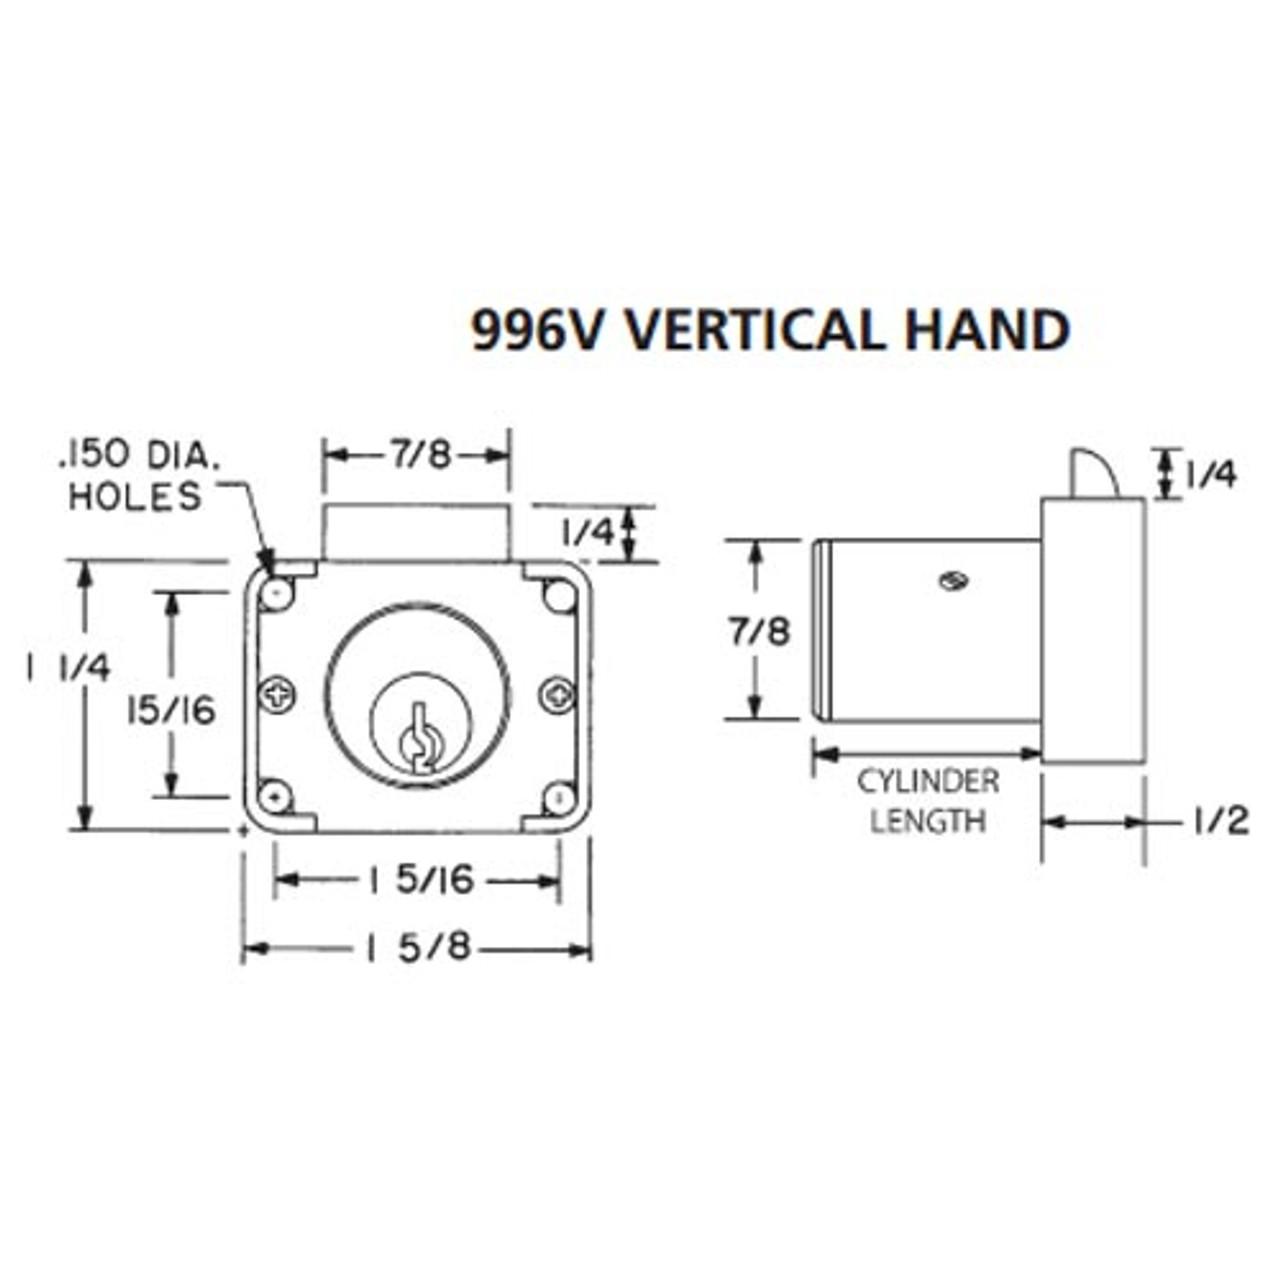 Olympus 996V-VH-KA4T2-26D-7/8 R Series Vertical Handing Cabinet Drawer Latch Lock in Satin Chrome